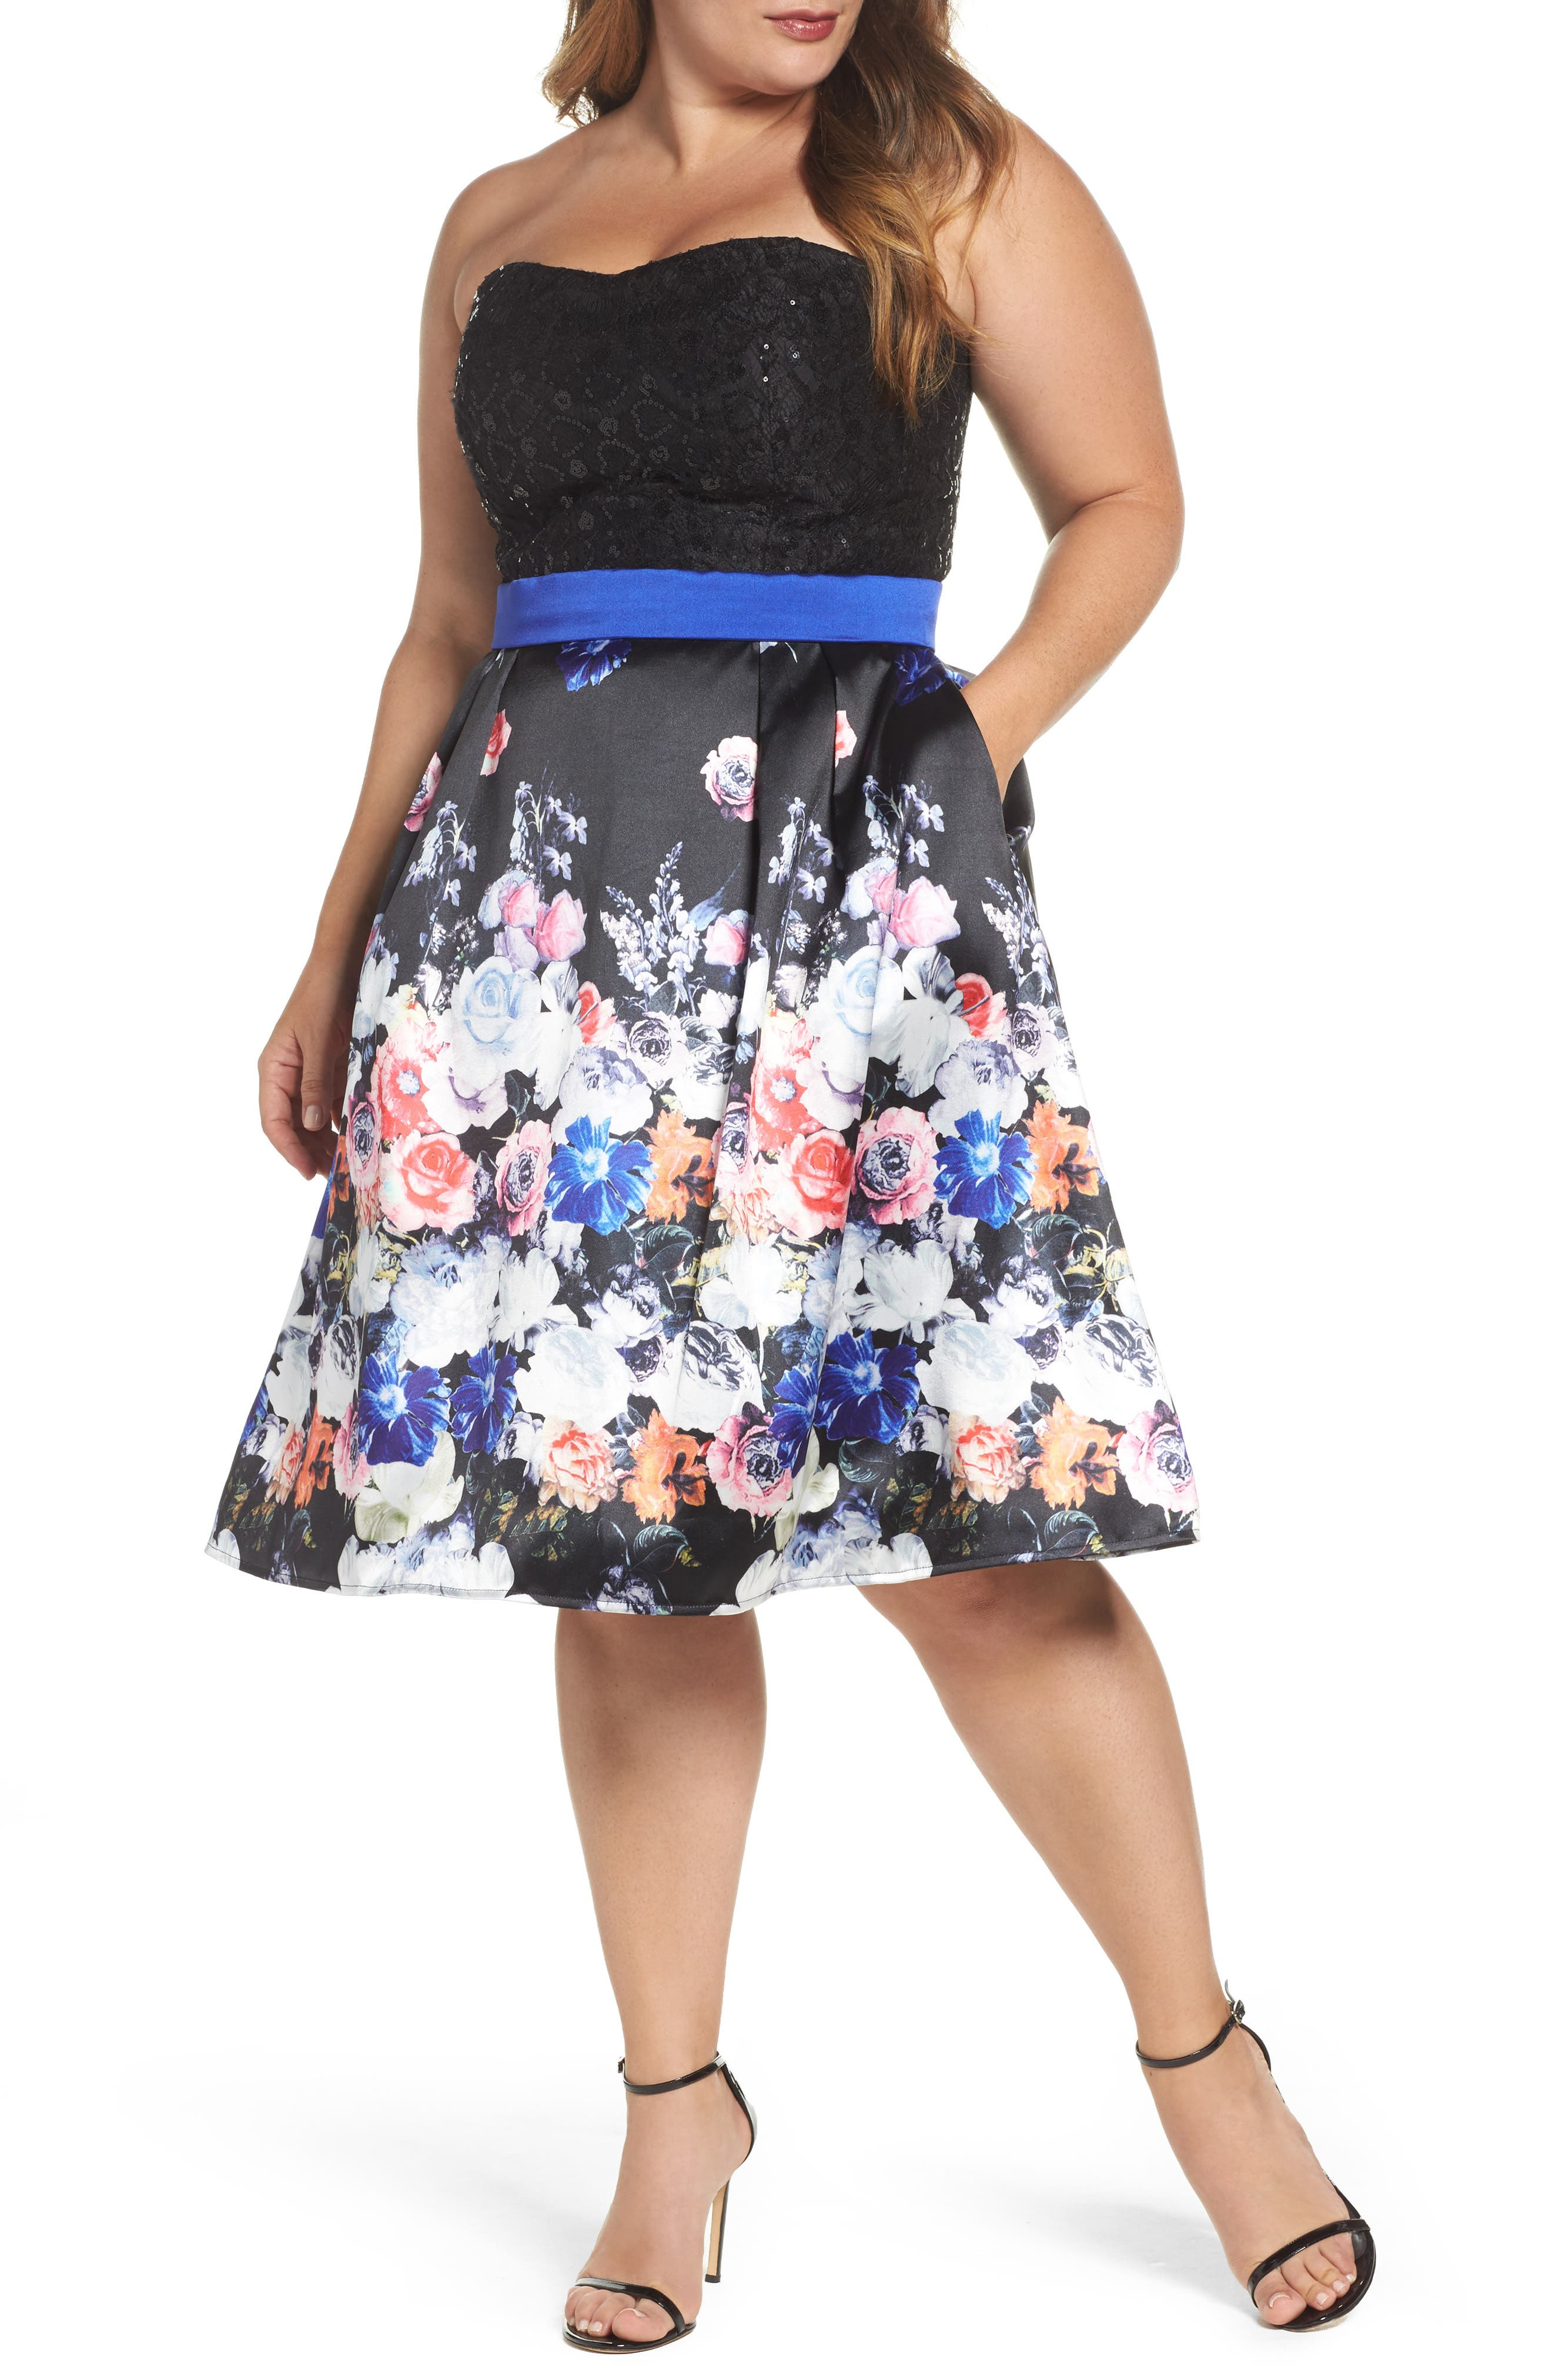 Floral Print Strapless Fit & Flare Dress,                             Main thumbnail 1, color,                             Black/ Multi